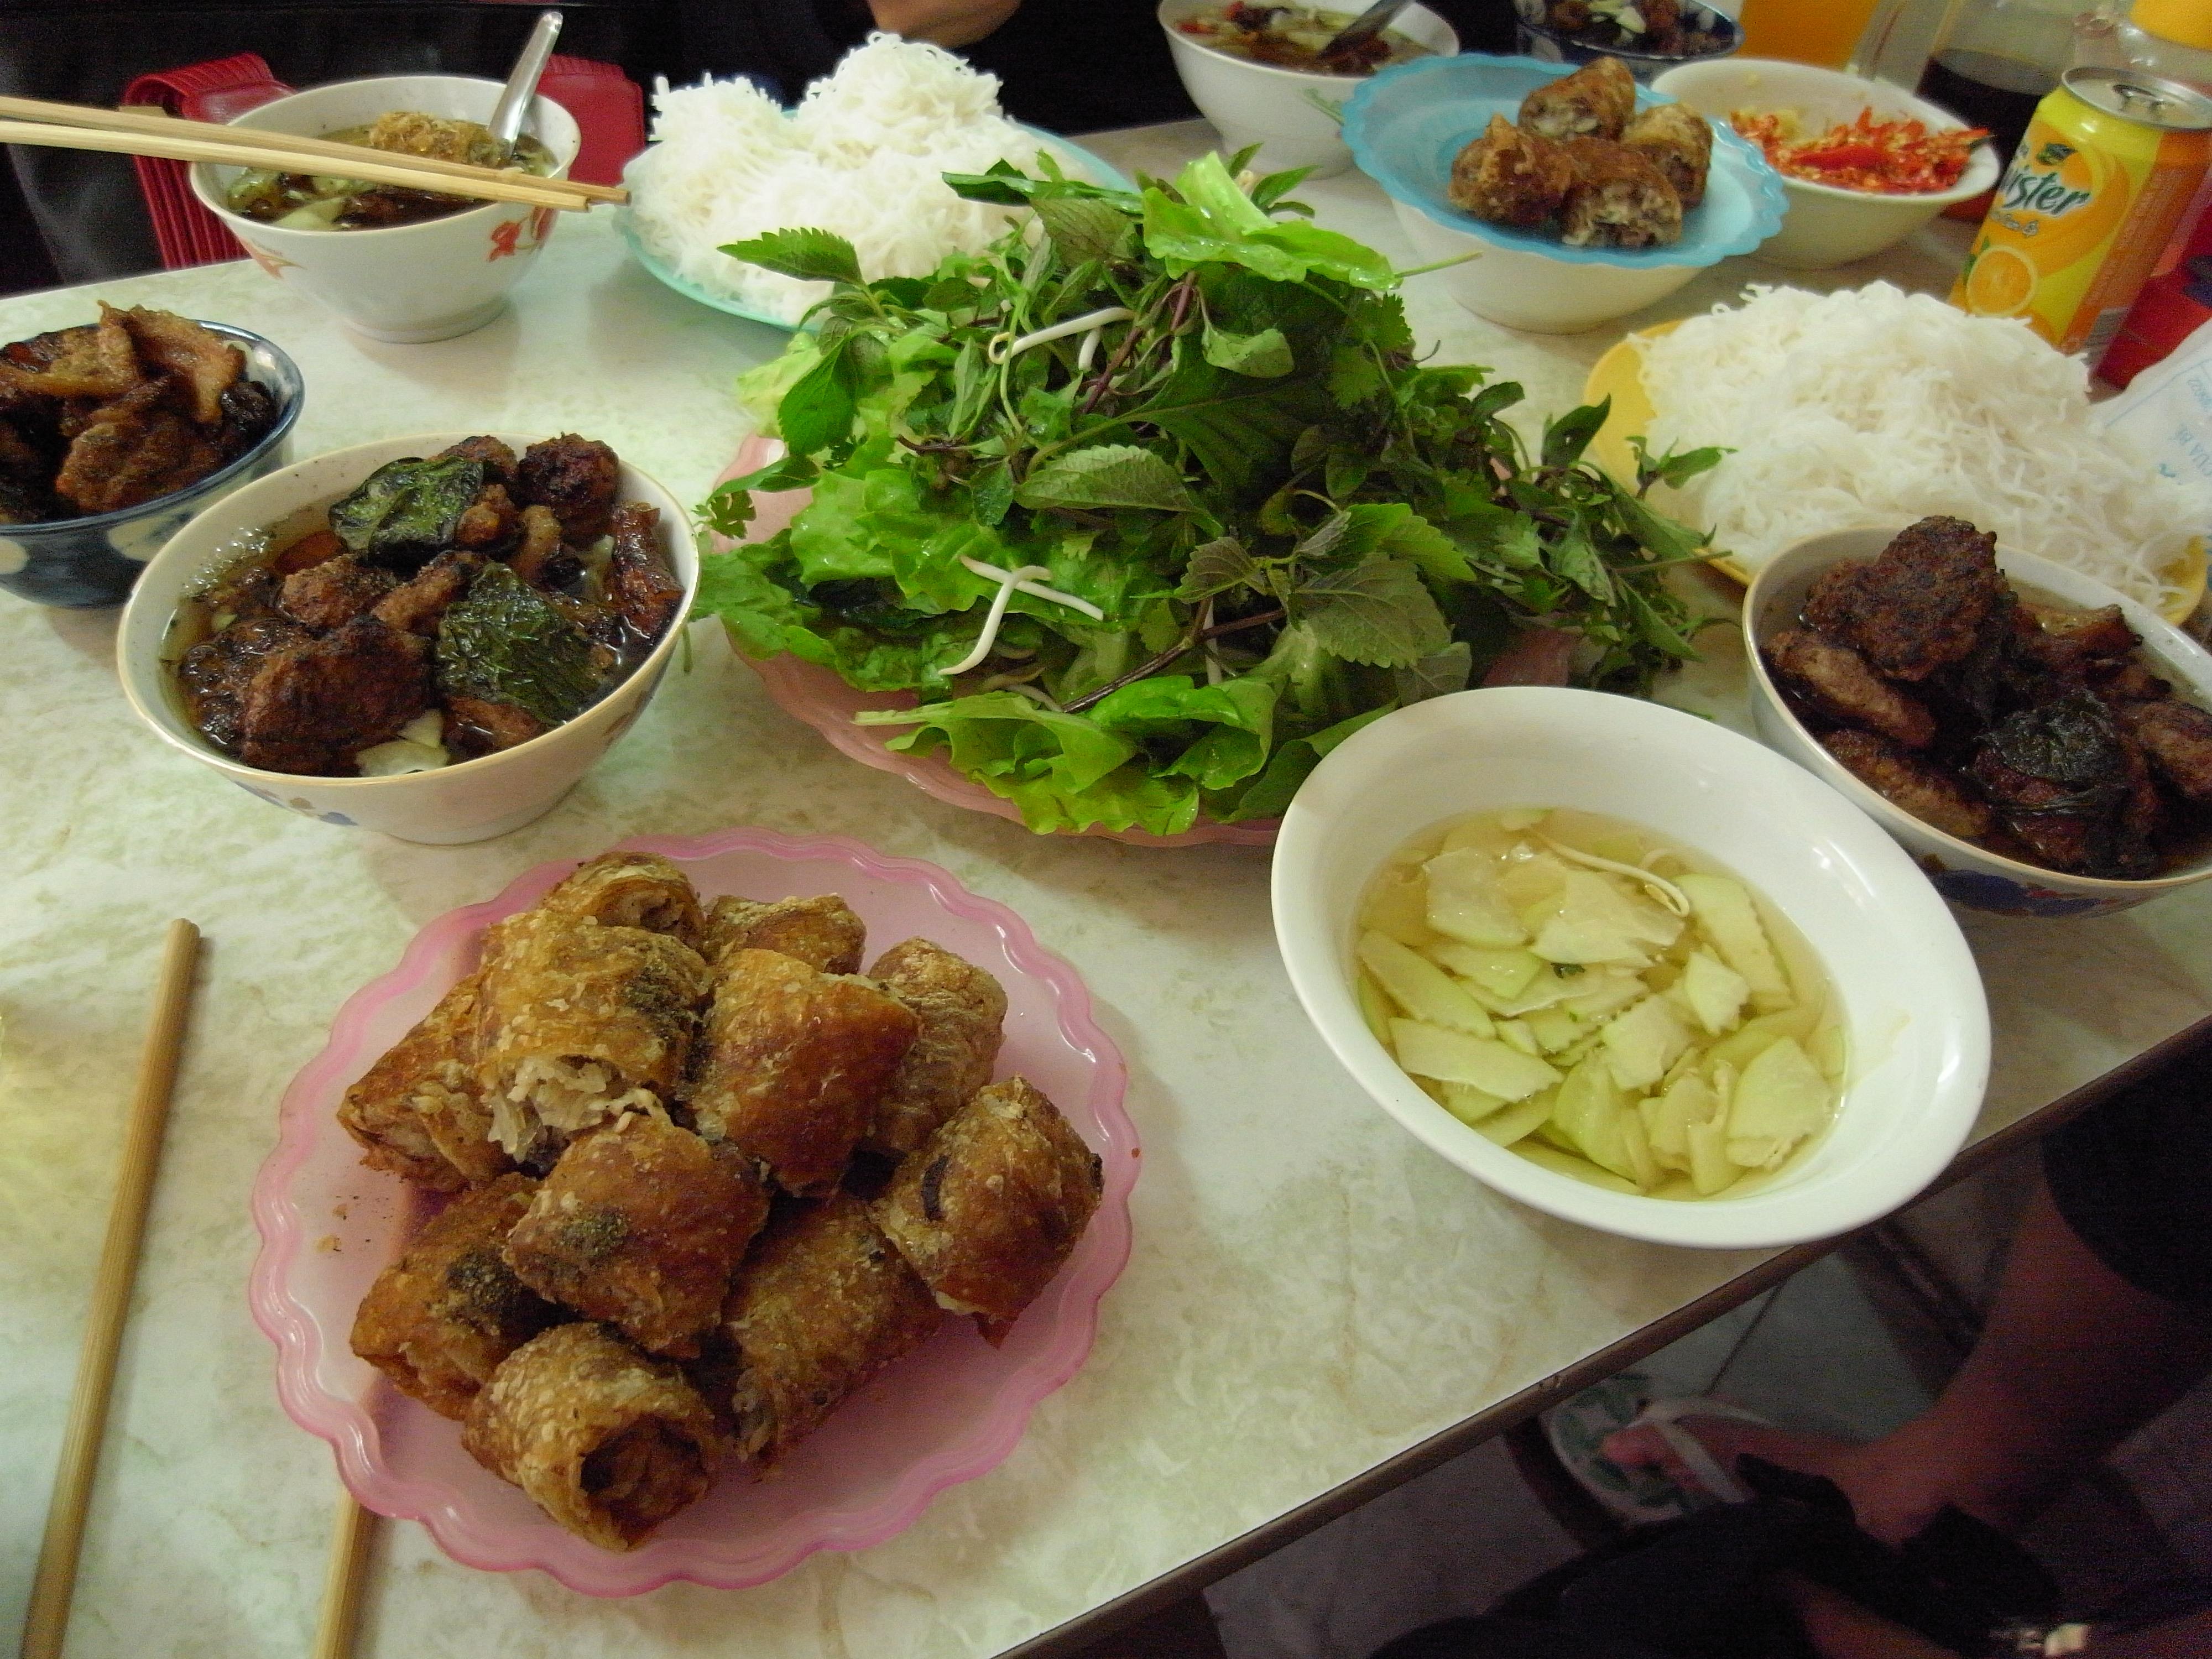 Vietnam Grill Restaurant Missoula Mt Menu